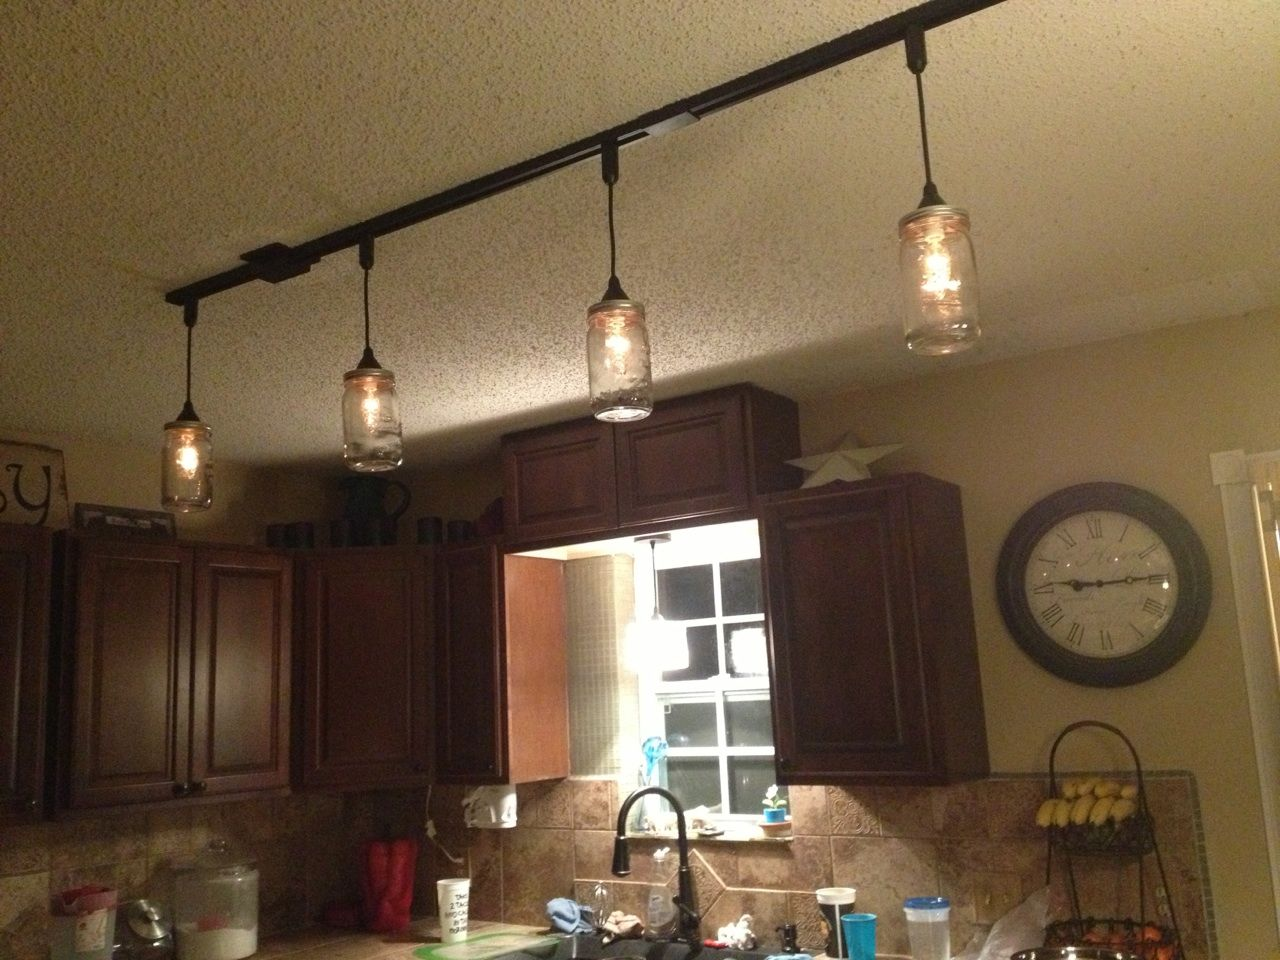 Mason jar kitchen lights diy craft projects pinterest for Mason jar kitchen ideas